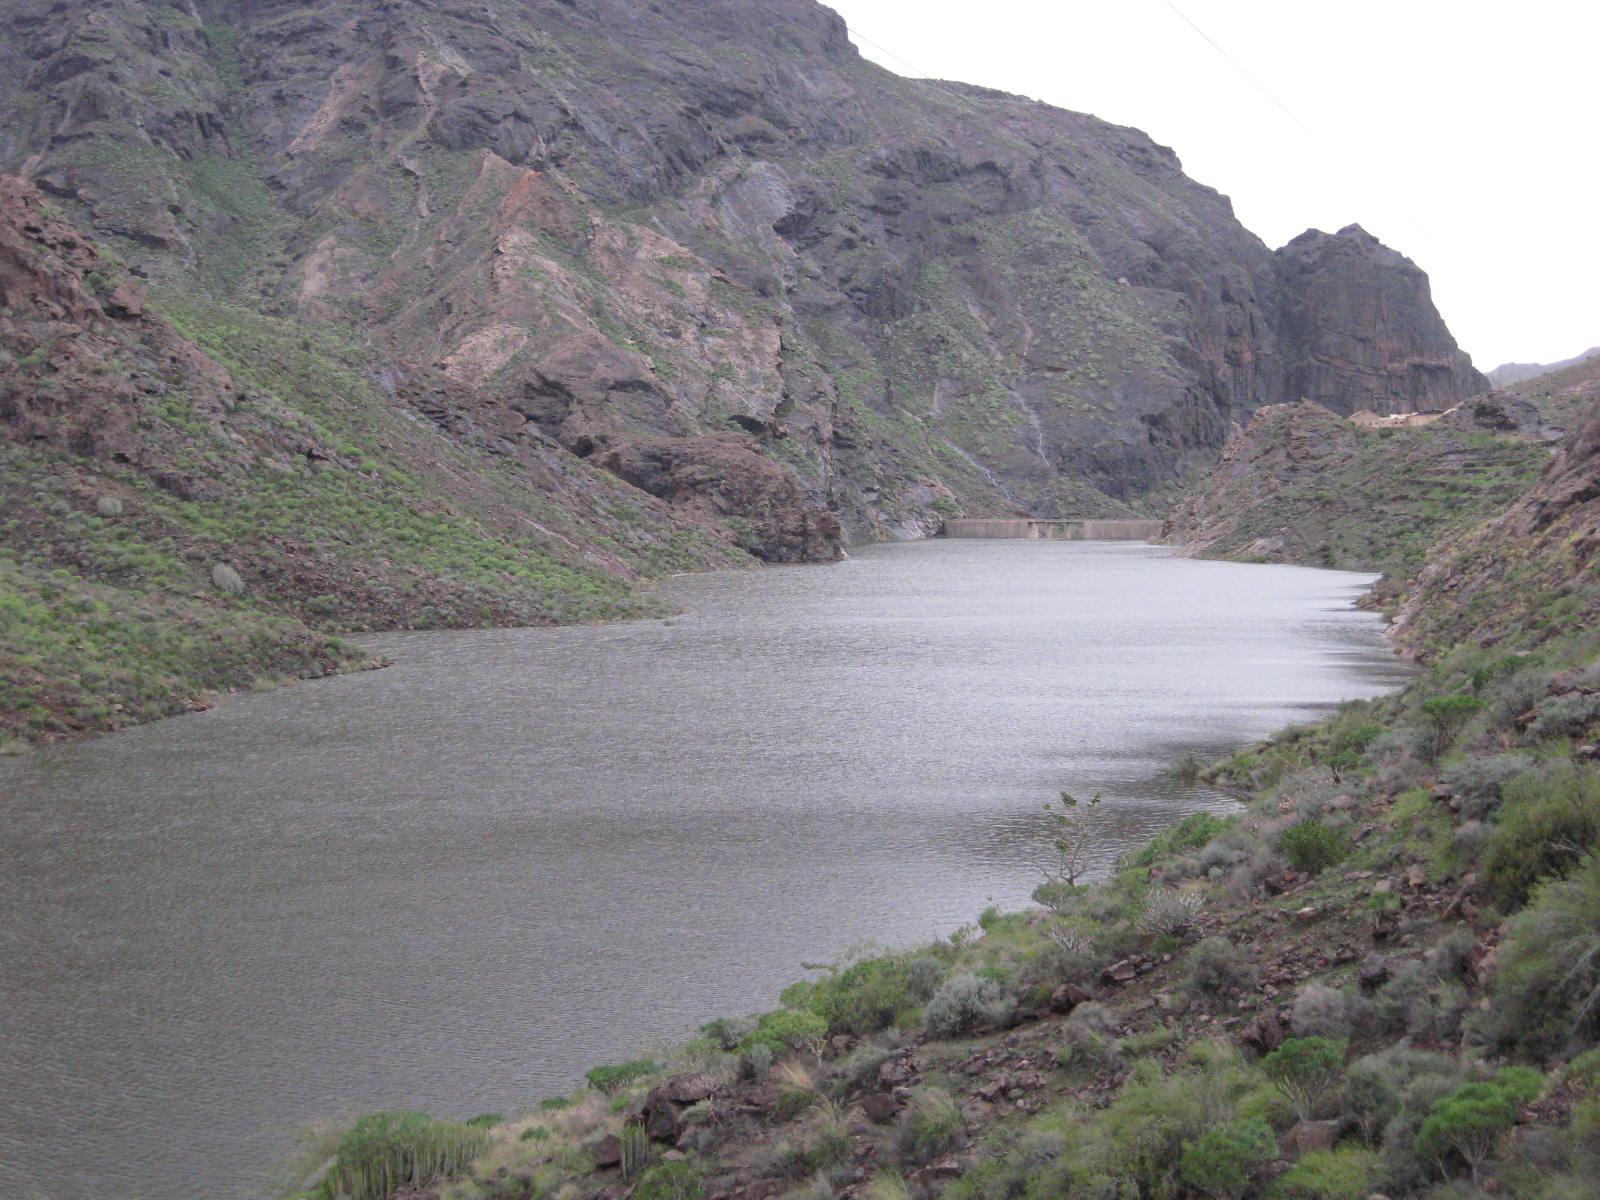 Vista de la presa de Caidero de la Niña